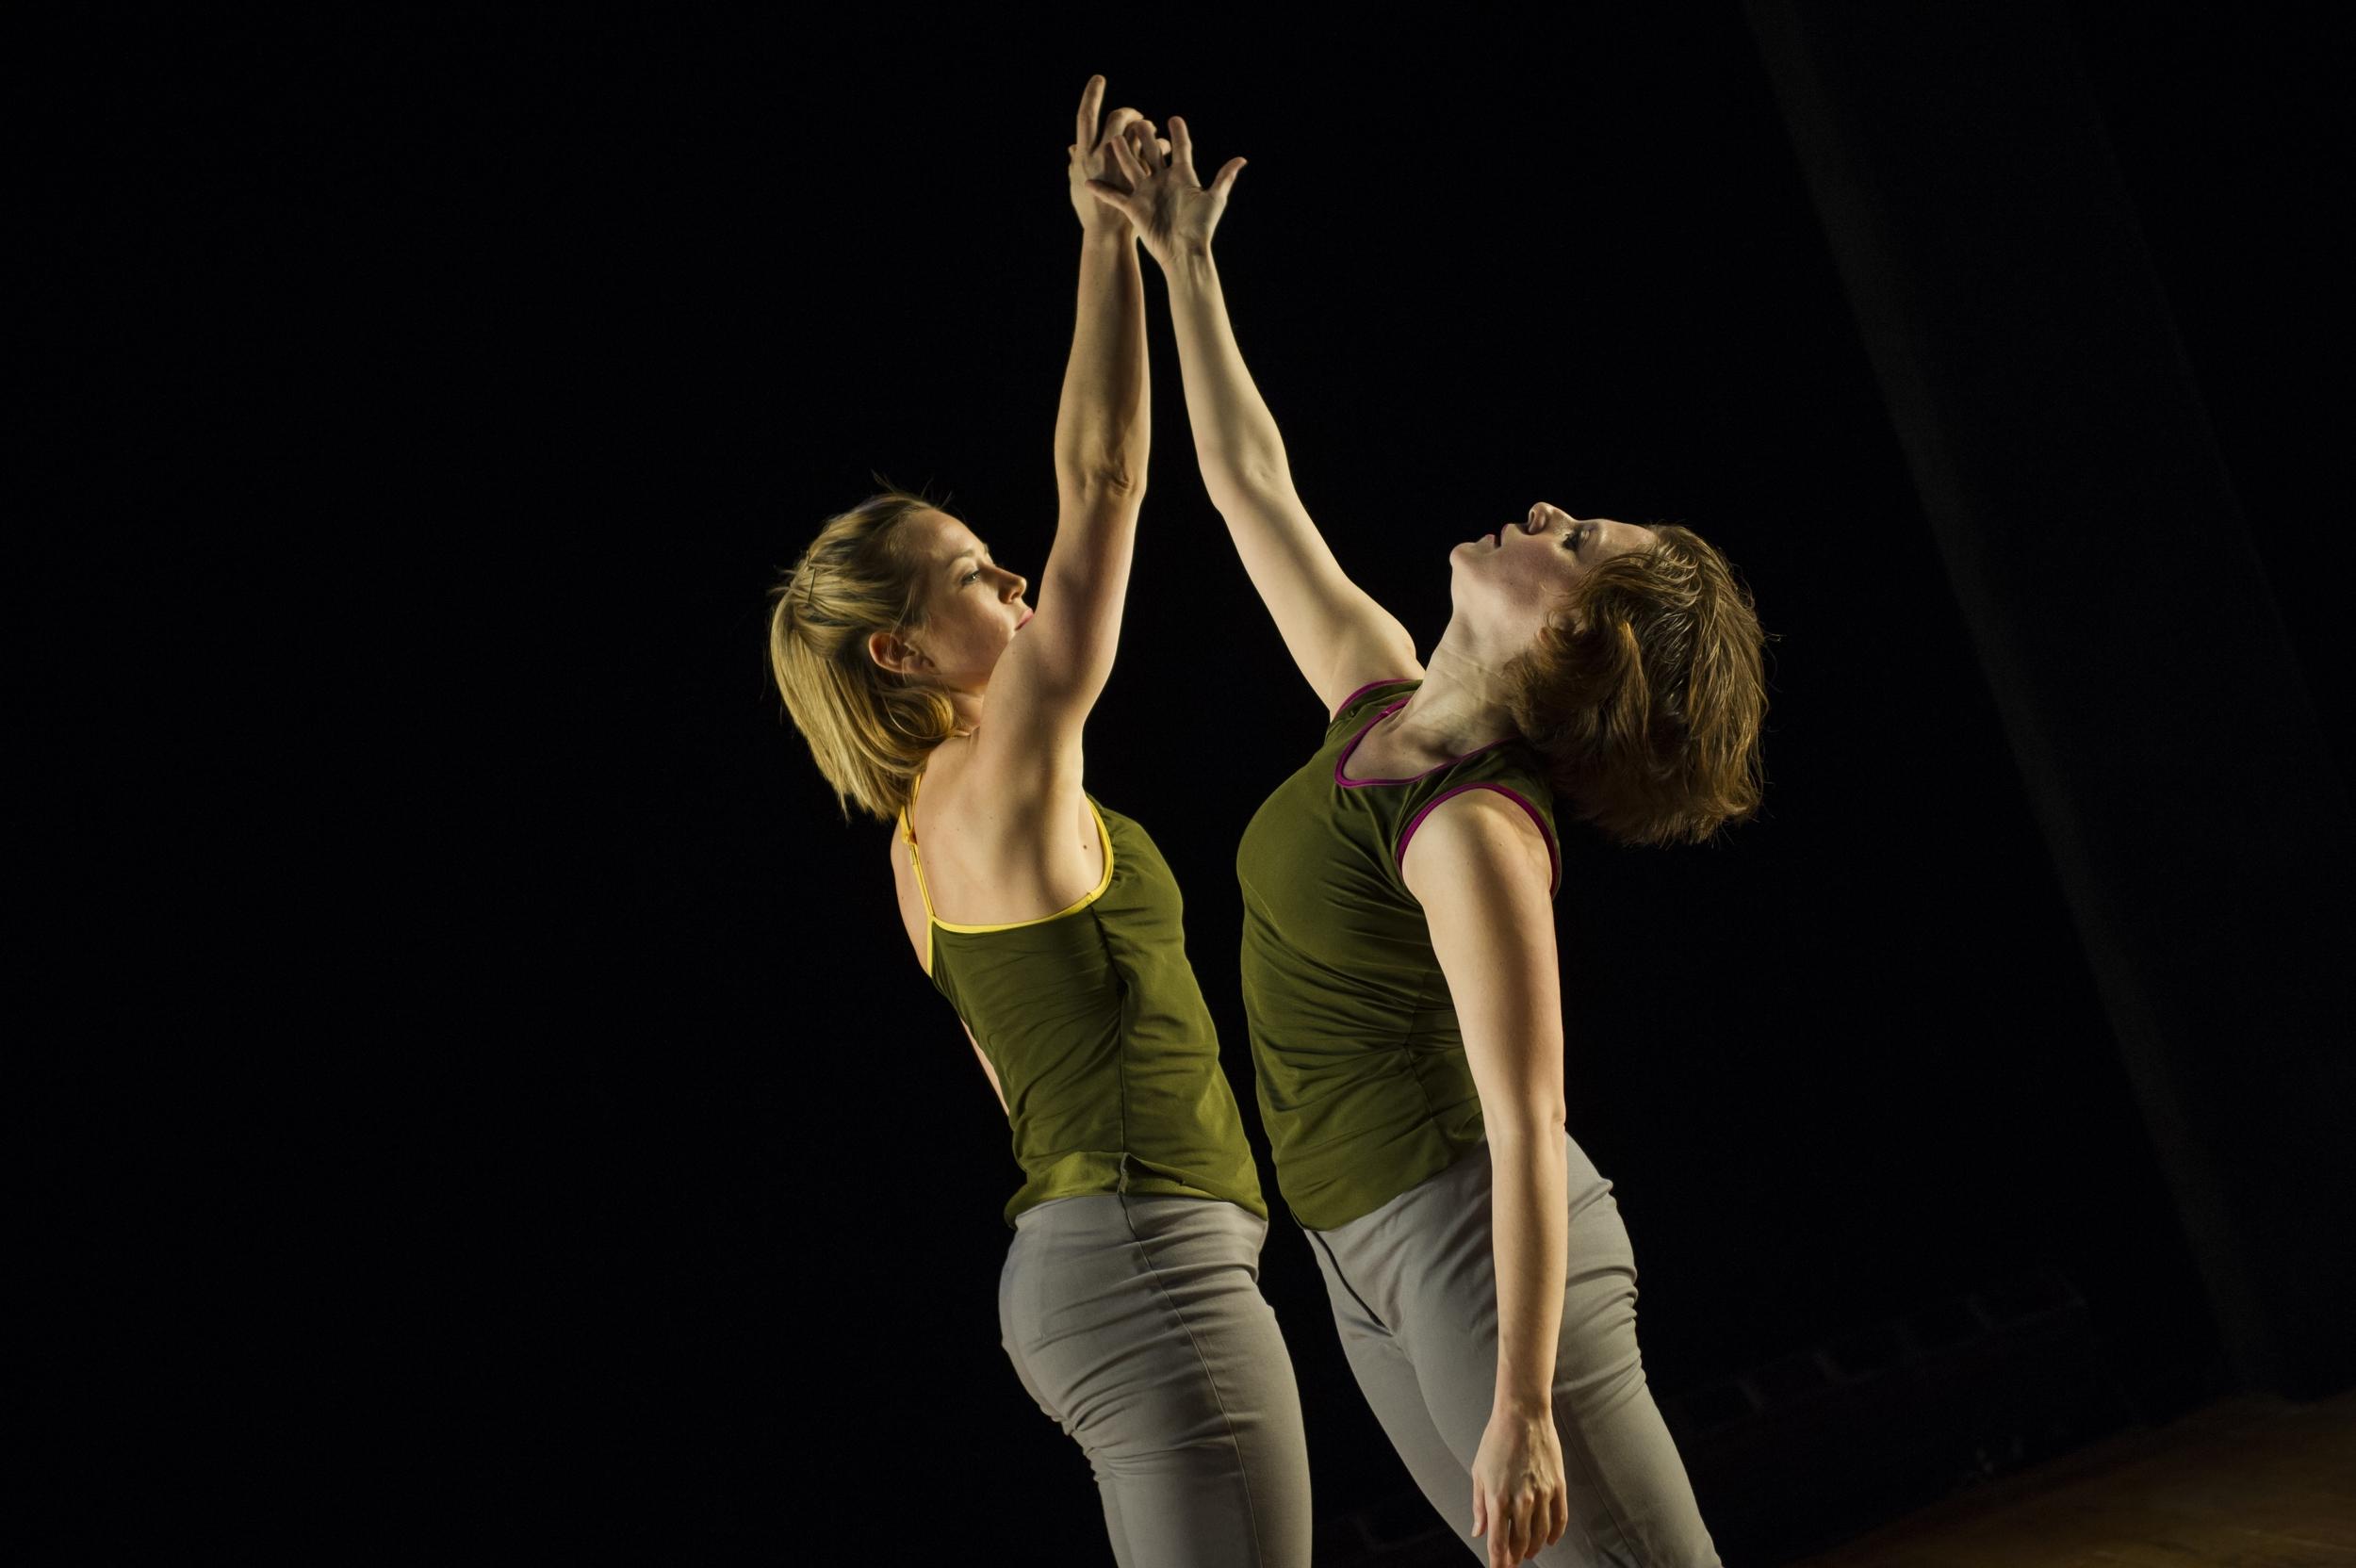 Sue_Bernhard_Danceworks_Paula_Lobo-27.jpg